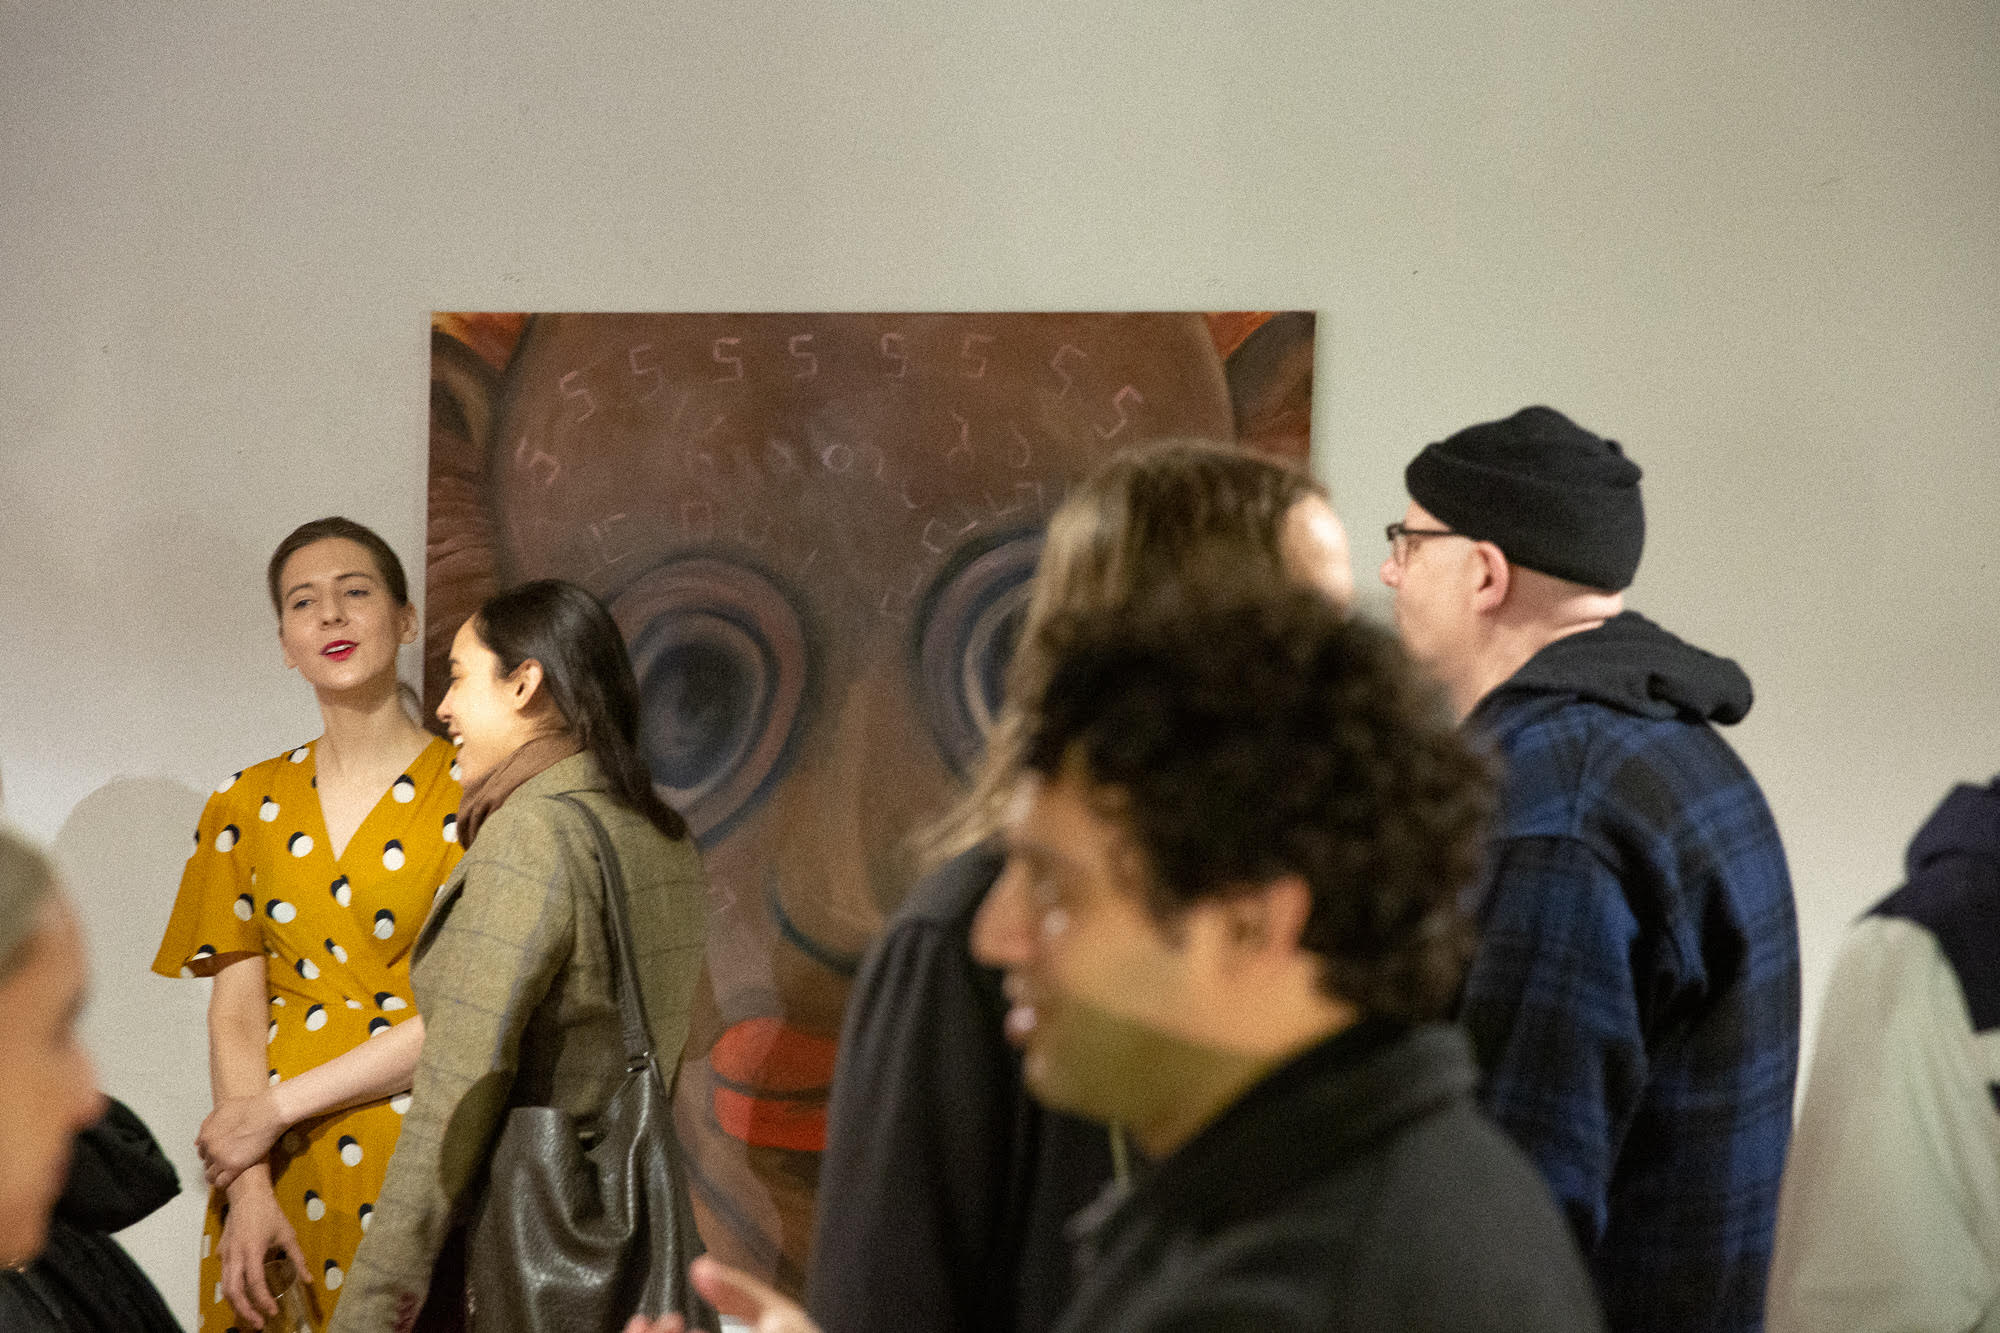 Ria Kacharava 4 #art живопись, искусство, Нью-Йорк, Риа Качарава, сша